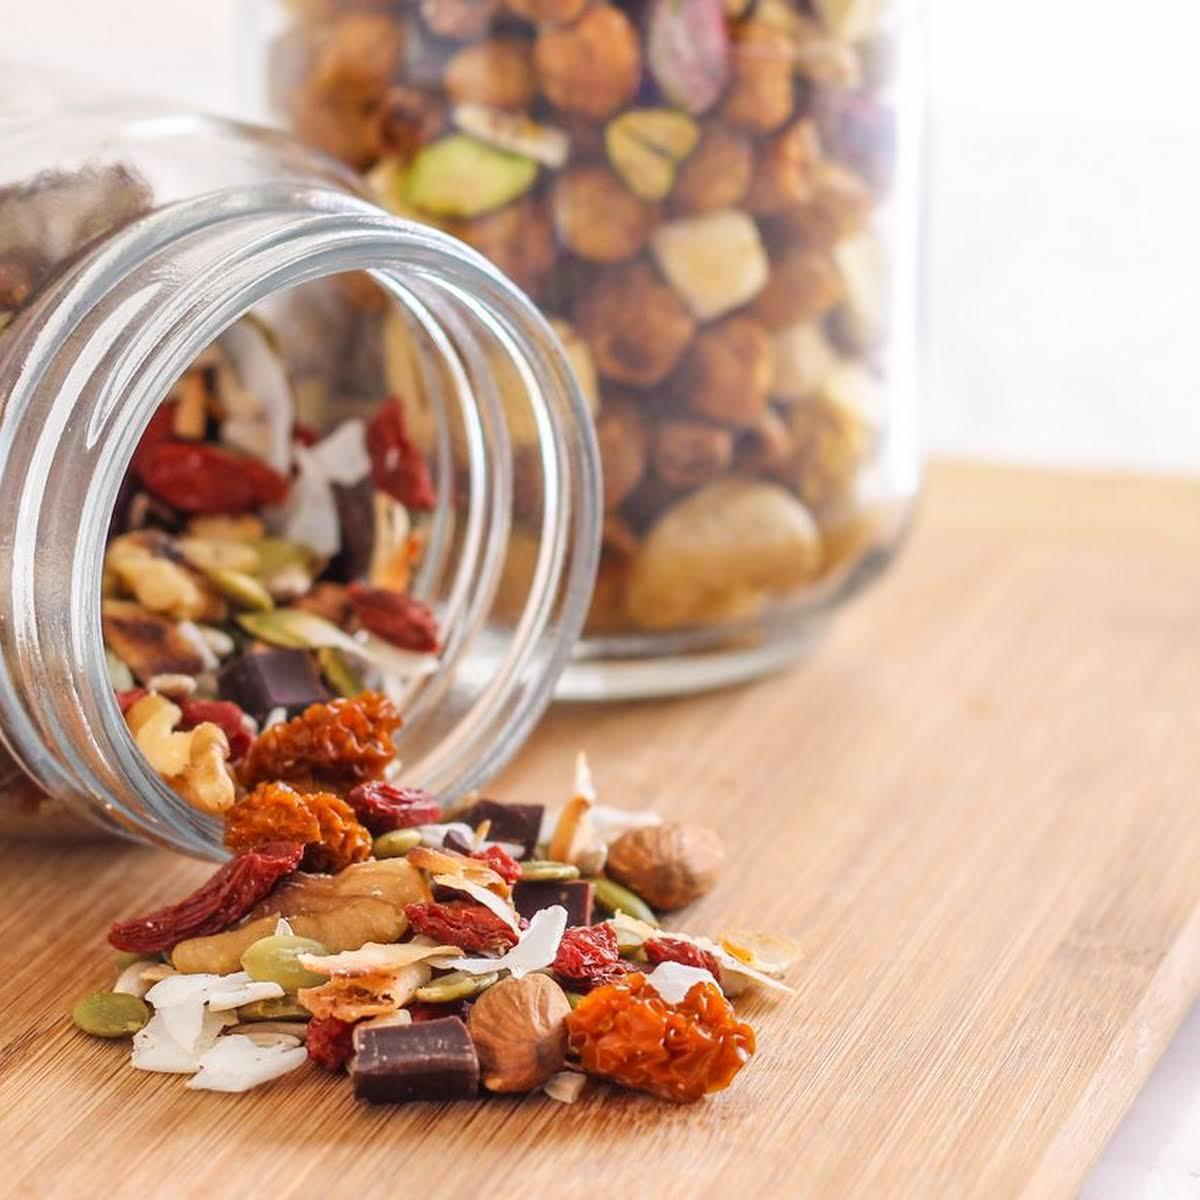 Health Nut's Indulgence Trail Mix